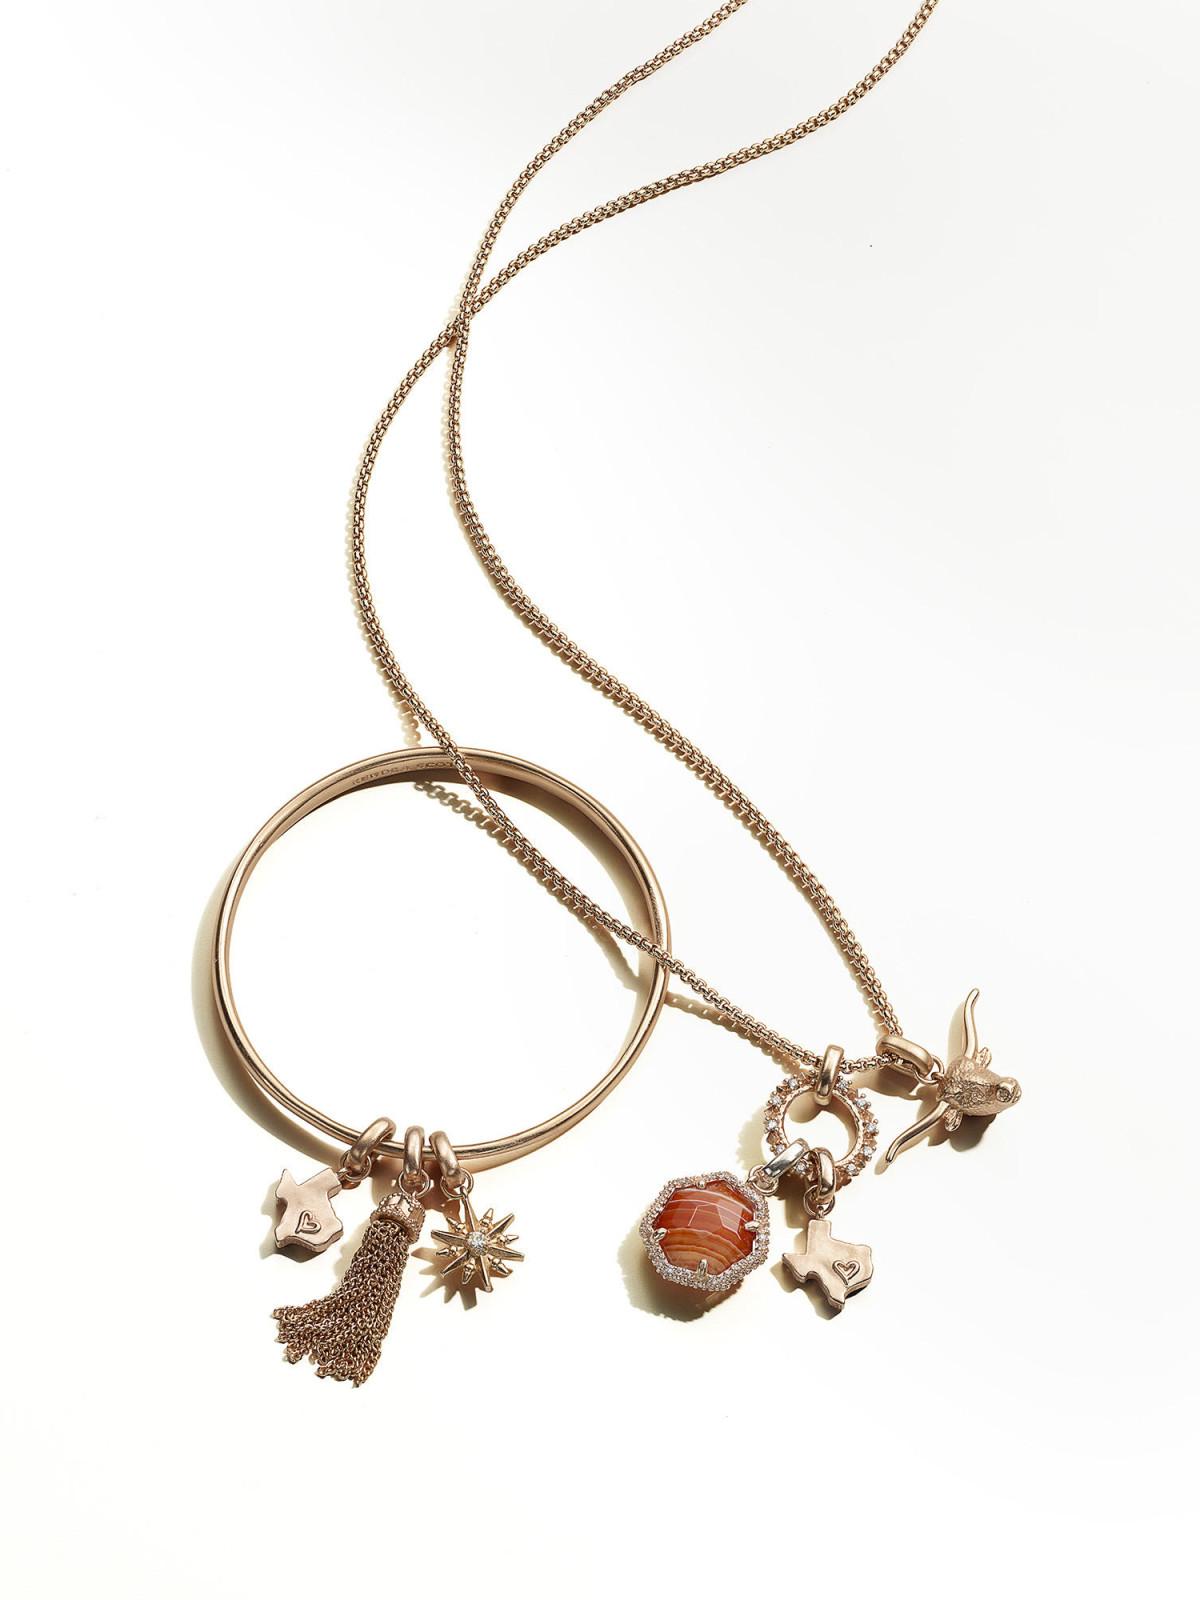 Kendra Scott charm jewelry